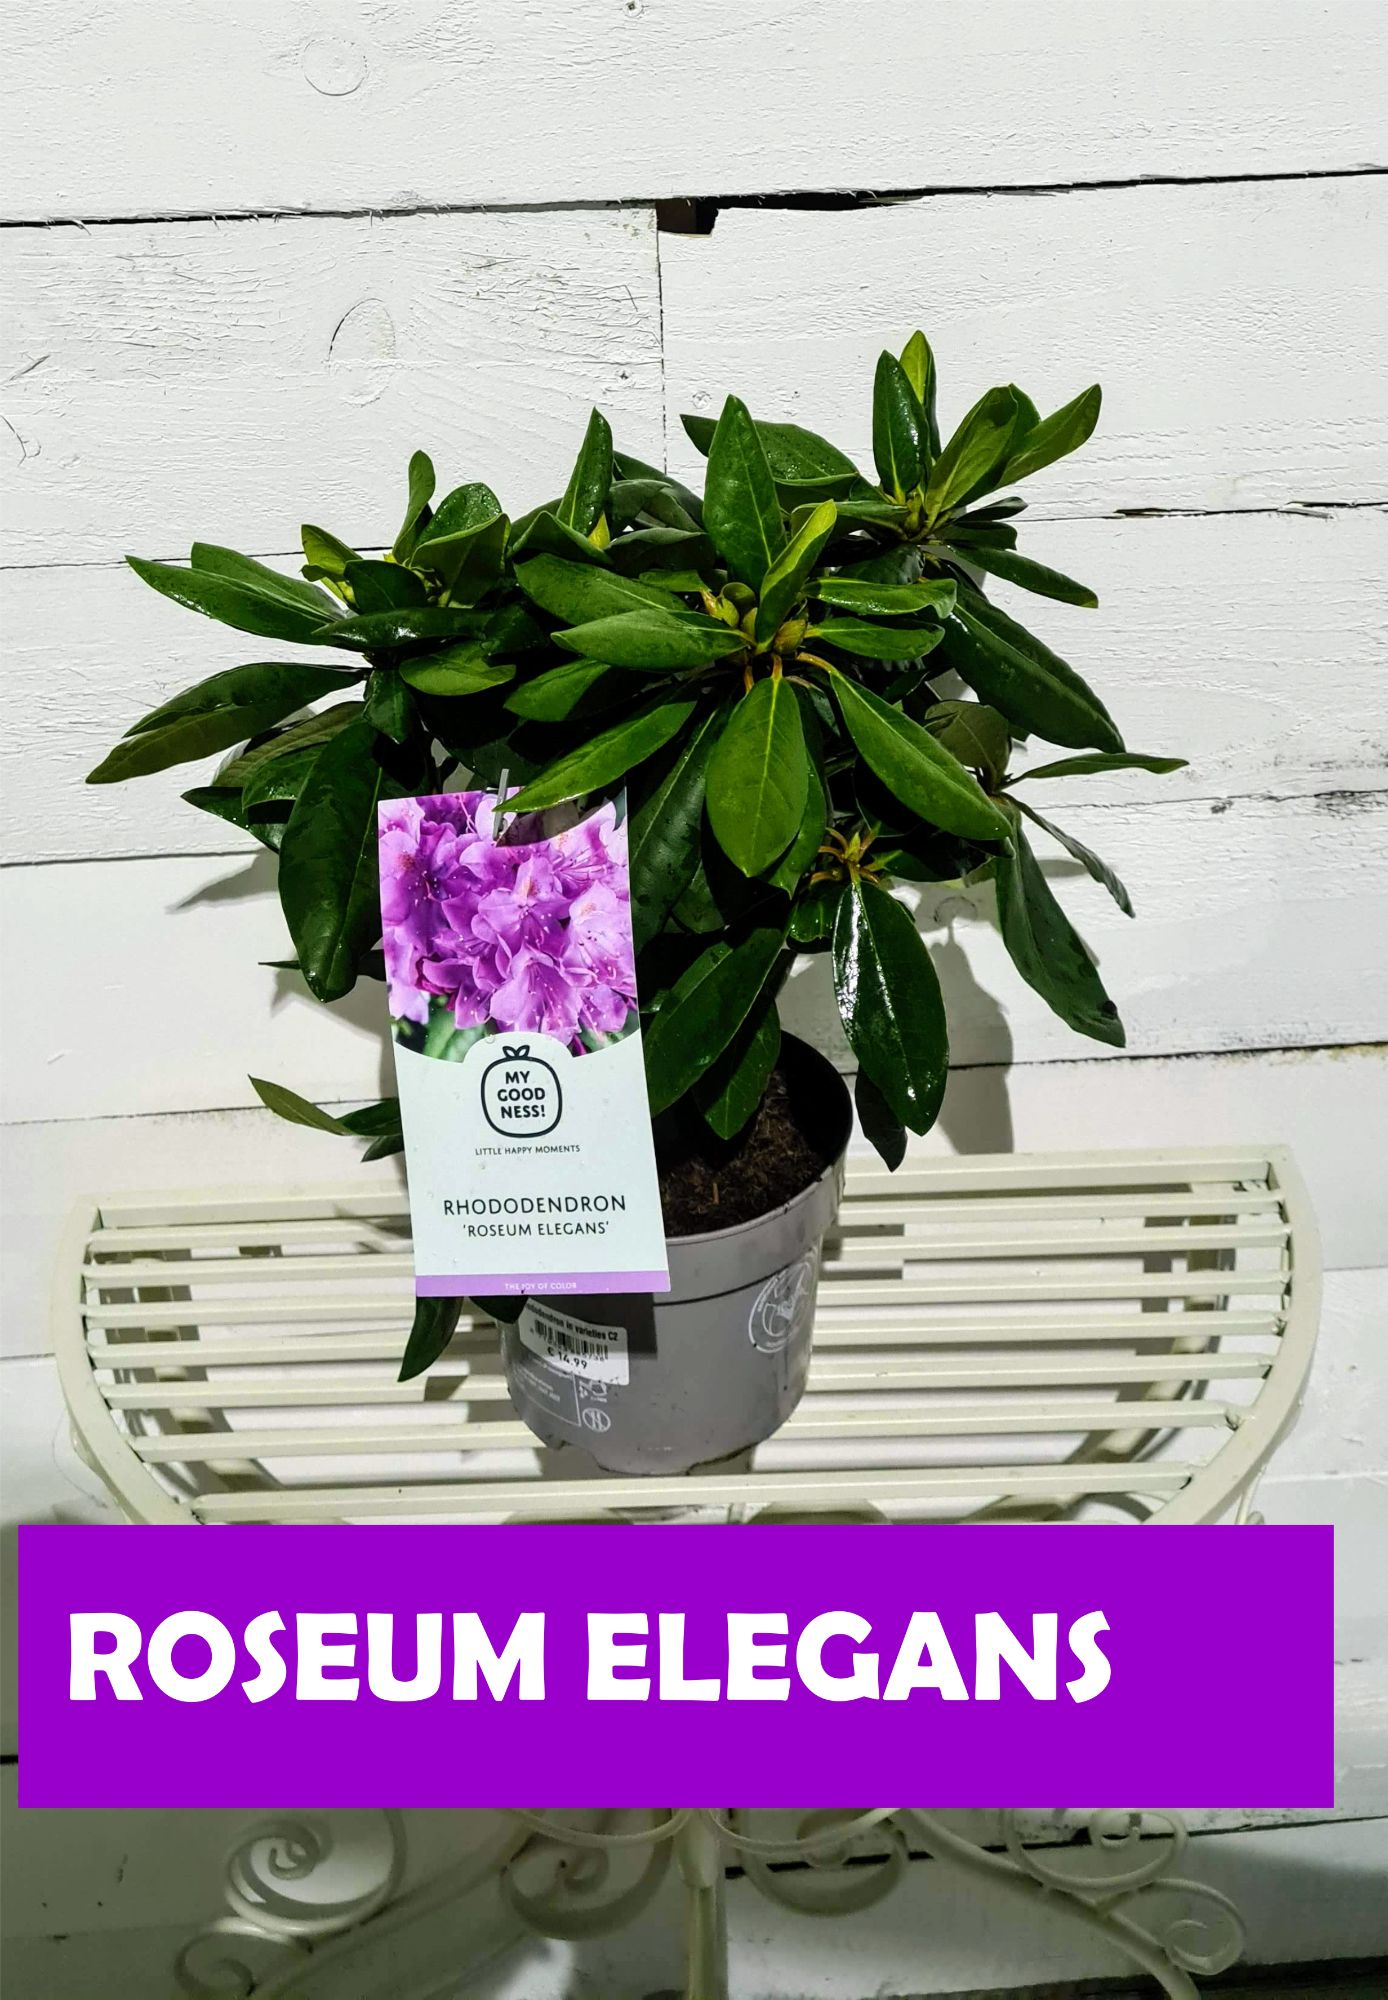 RHODODENDRON_MIX_ROSEUM_ELEGANS